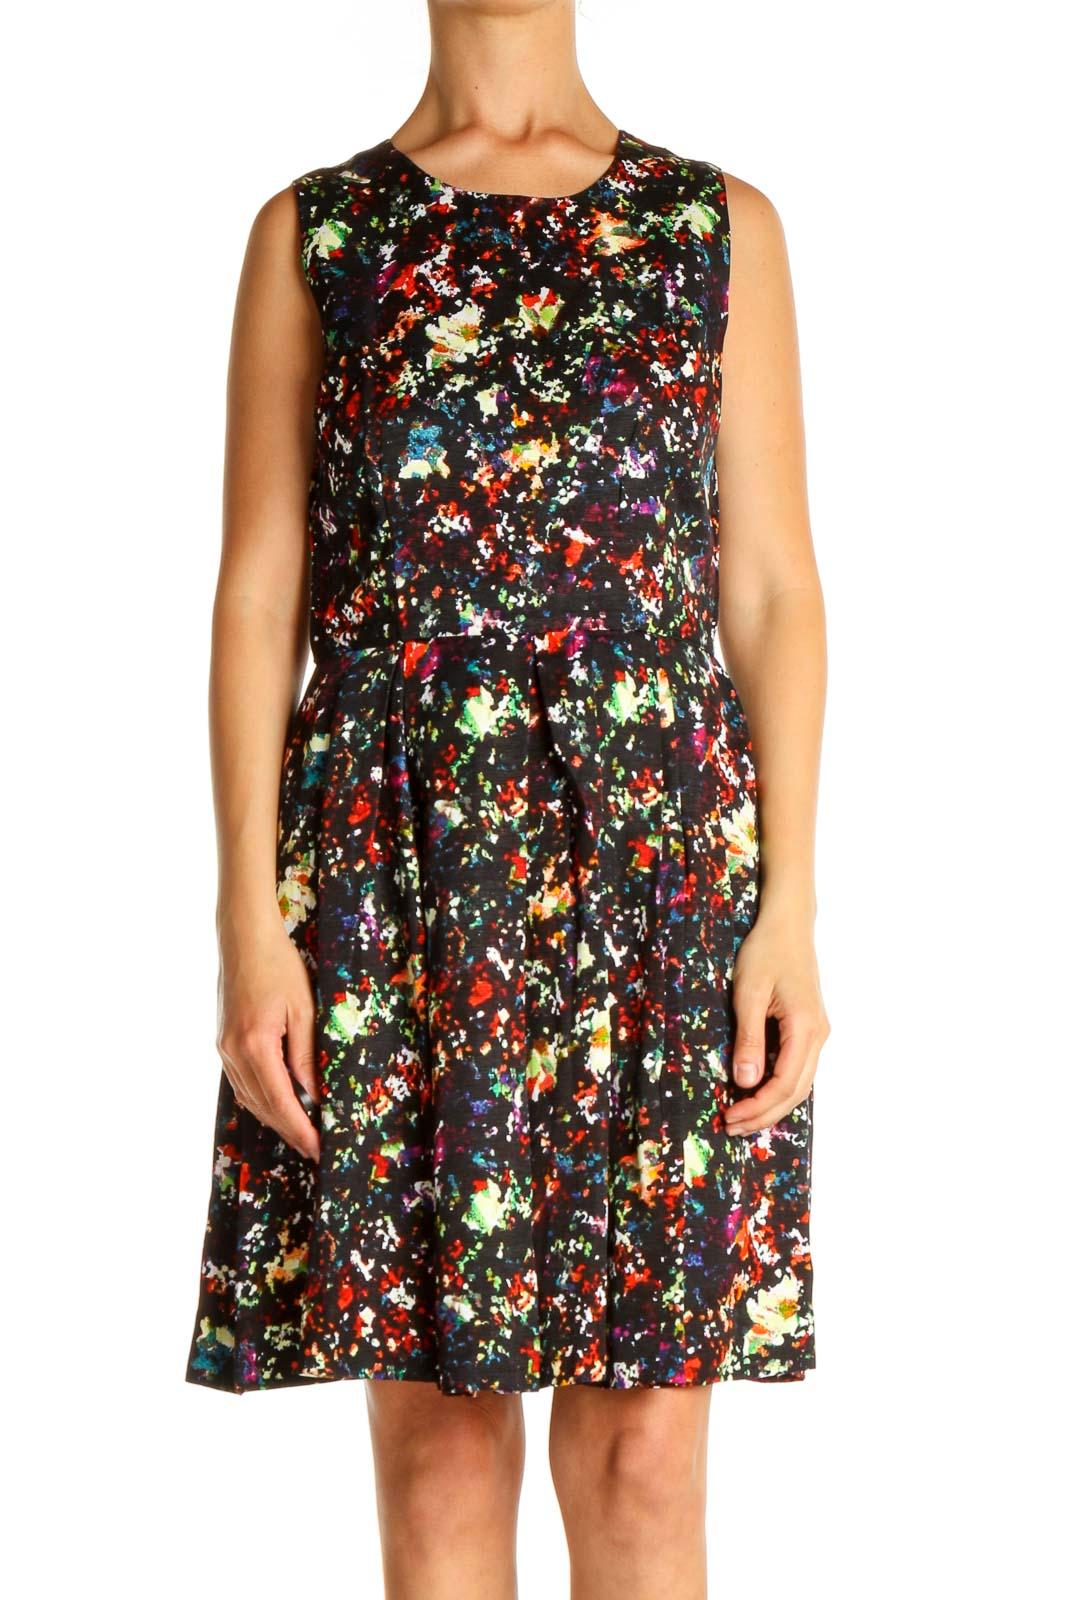 Black Floral Print Classic Dress Front